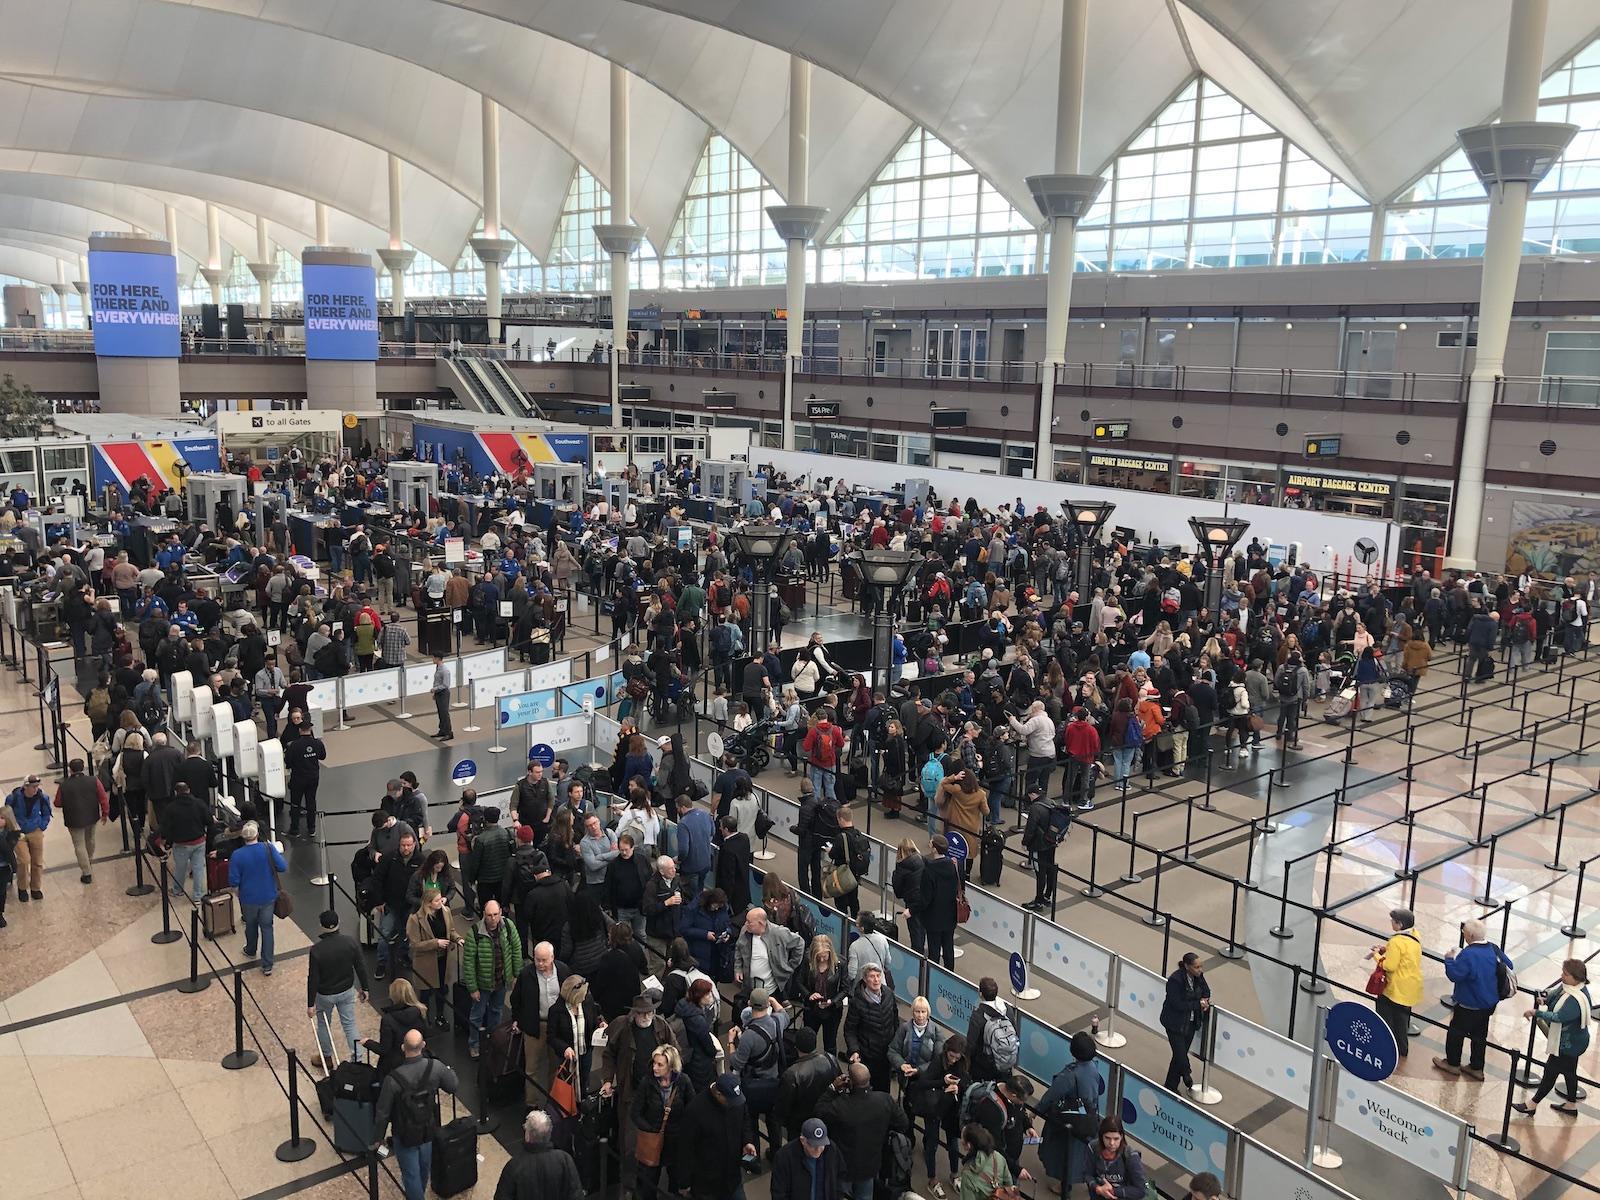 Jeppesen Terminal Denver Airport Crowd